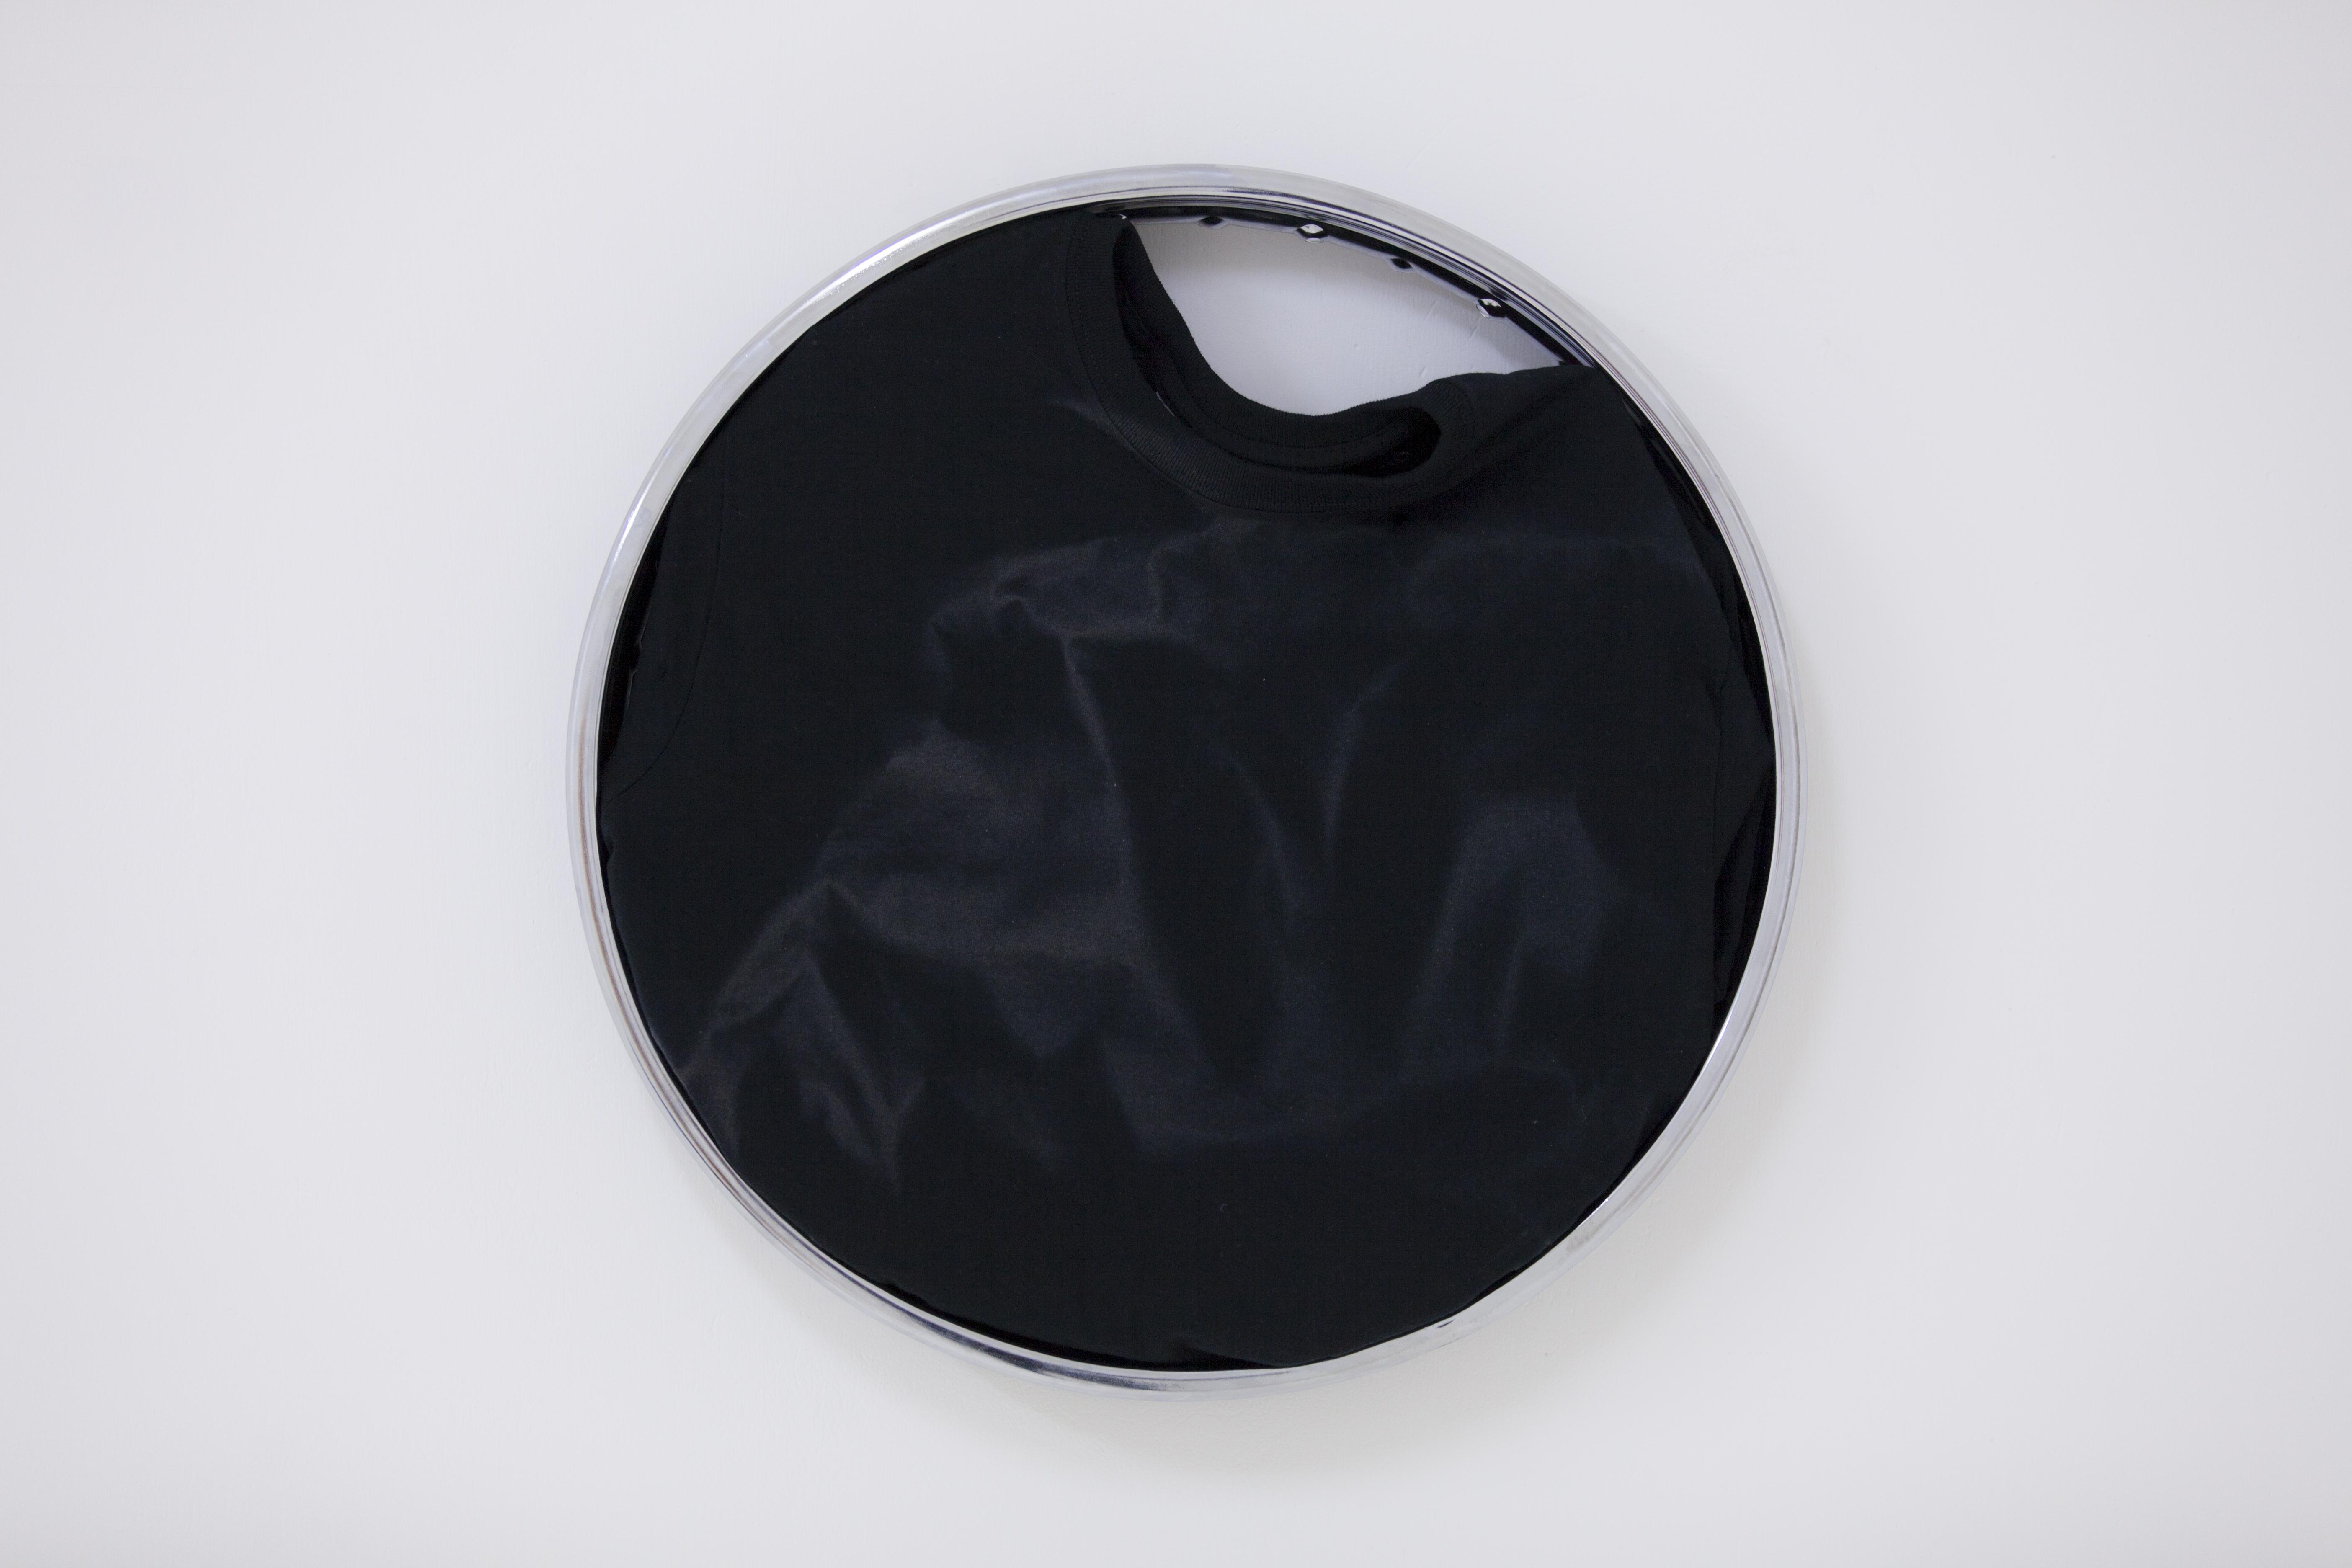 Anna Bąk, Open out like arose losing itself petal bypetal I, nasłoneczniona koszulka, felga aluminiowa, 2015